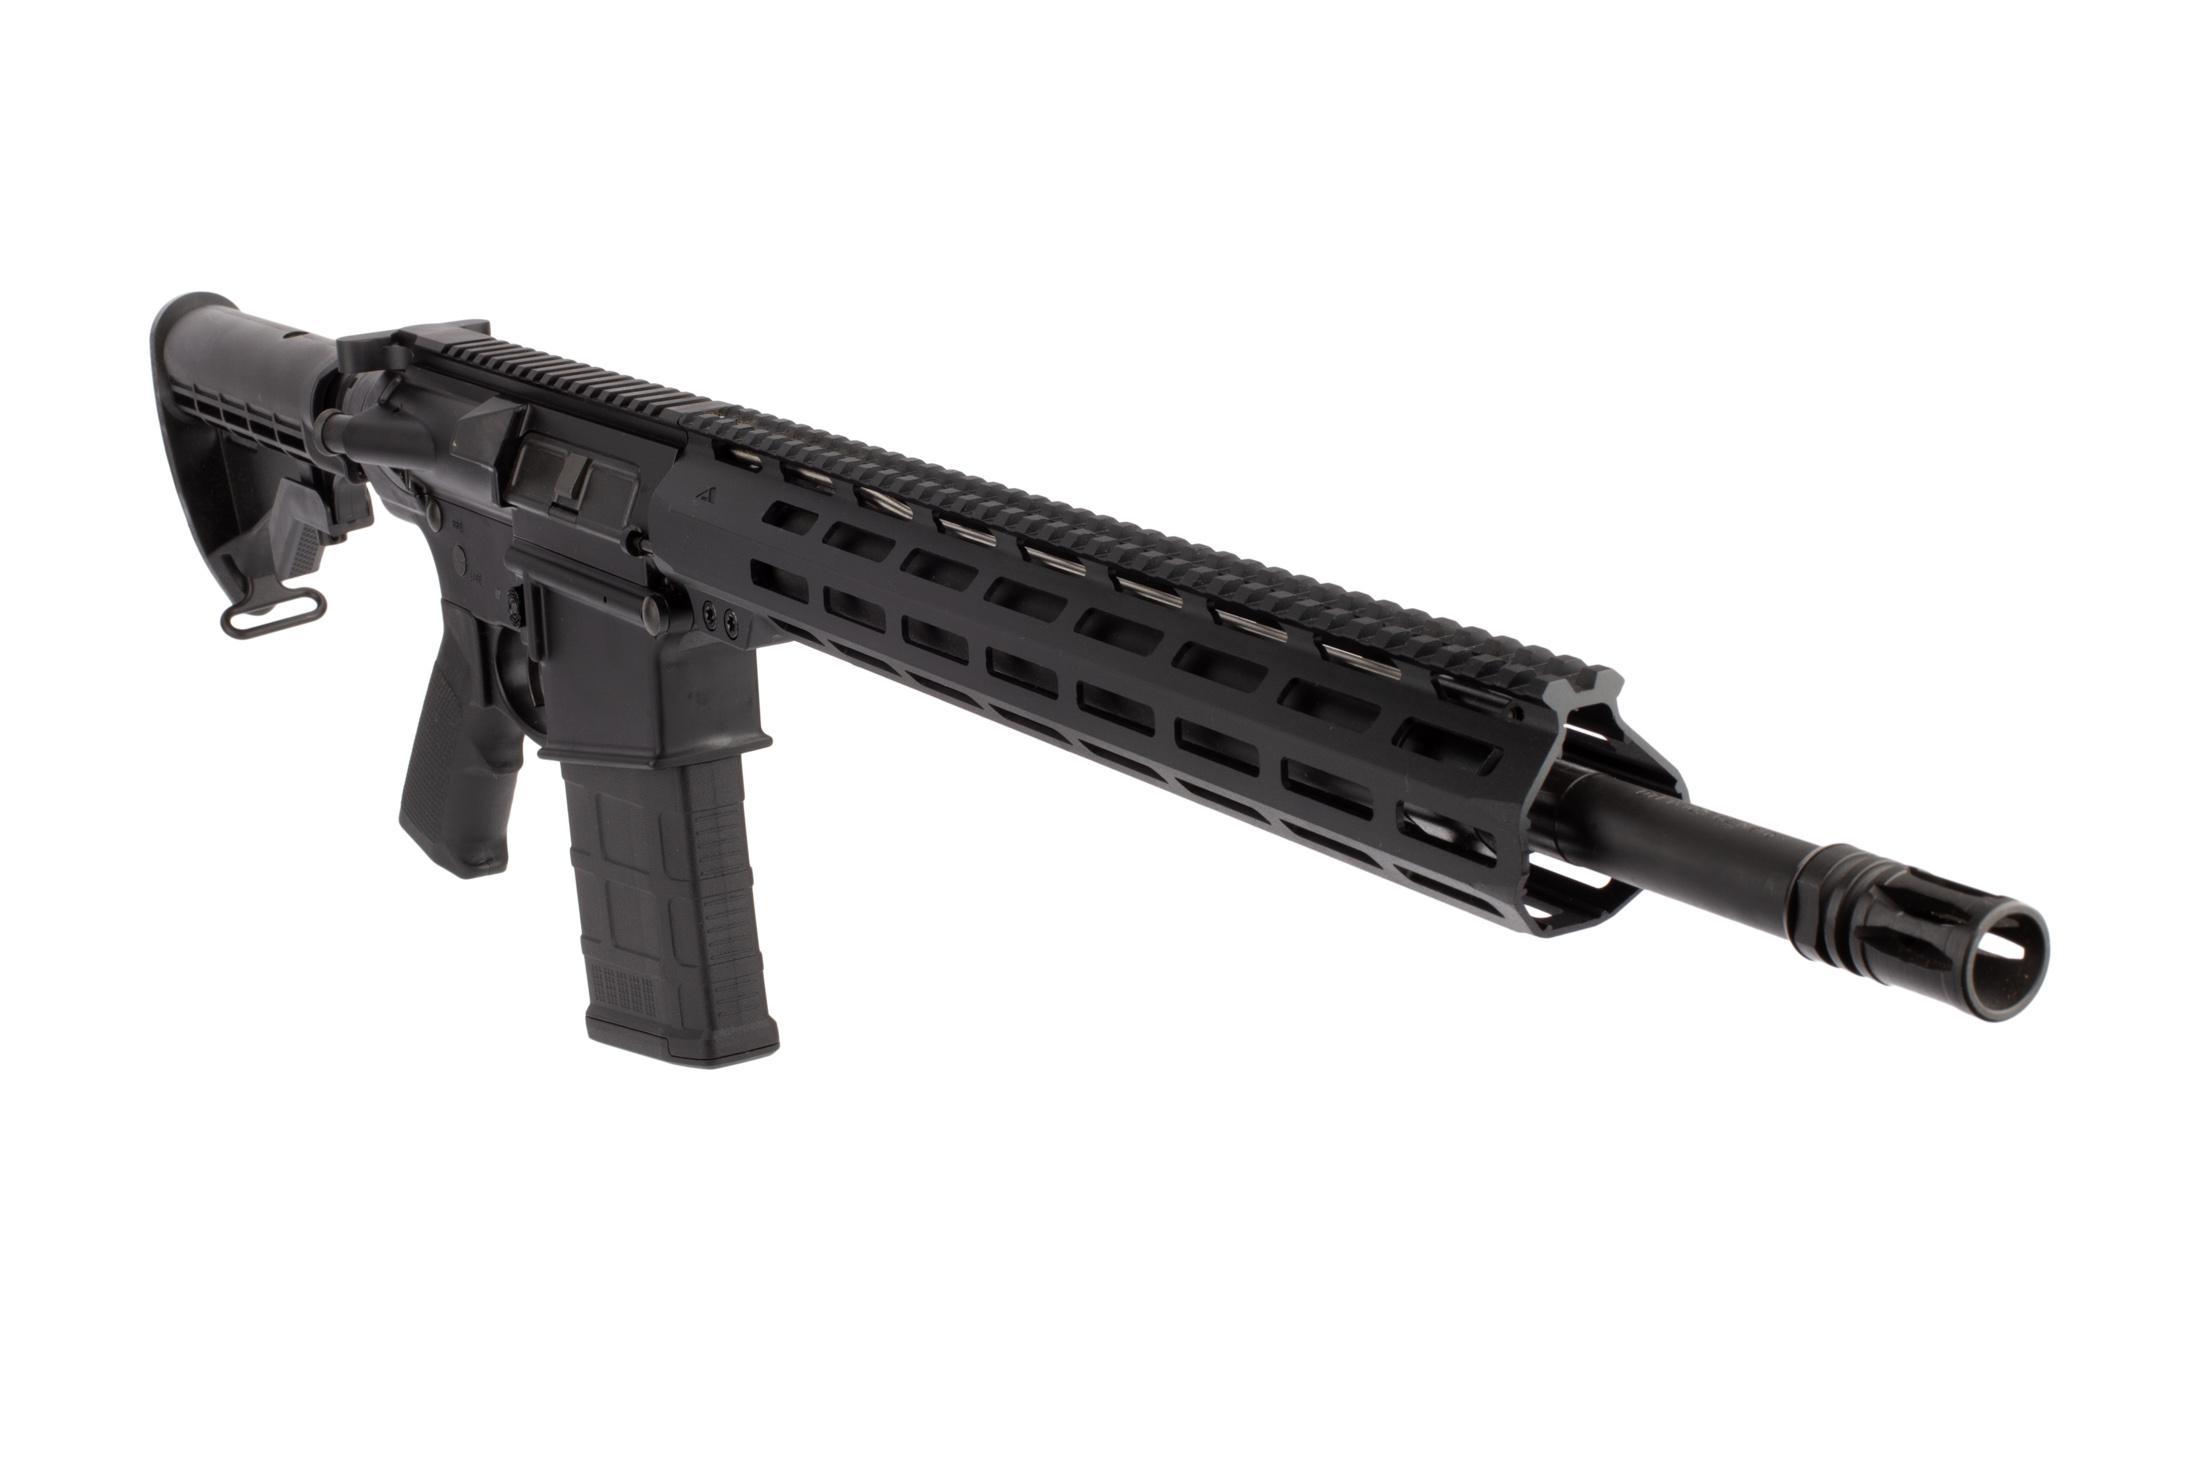 Del Ton AR 308 Rifles for sale